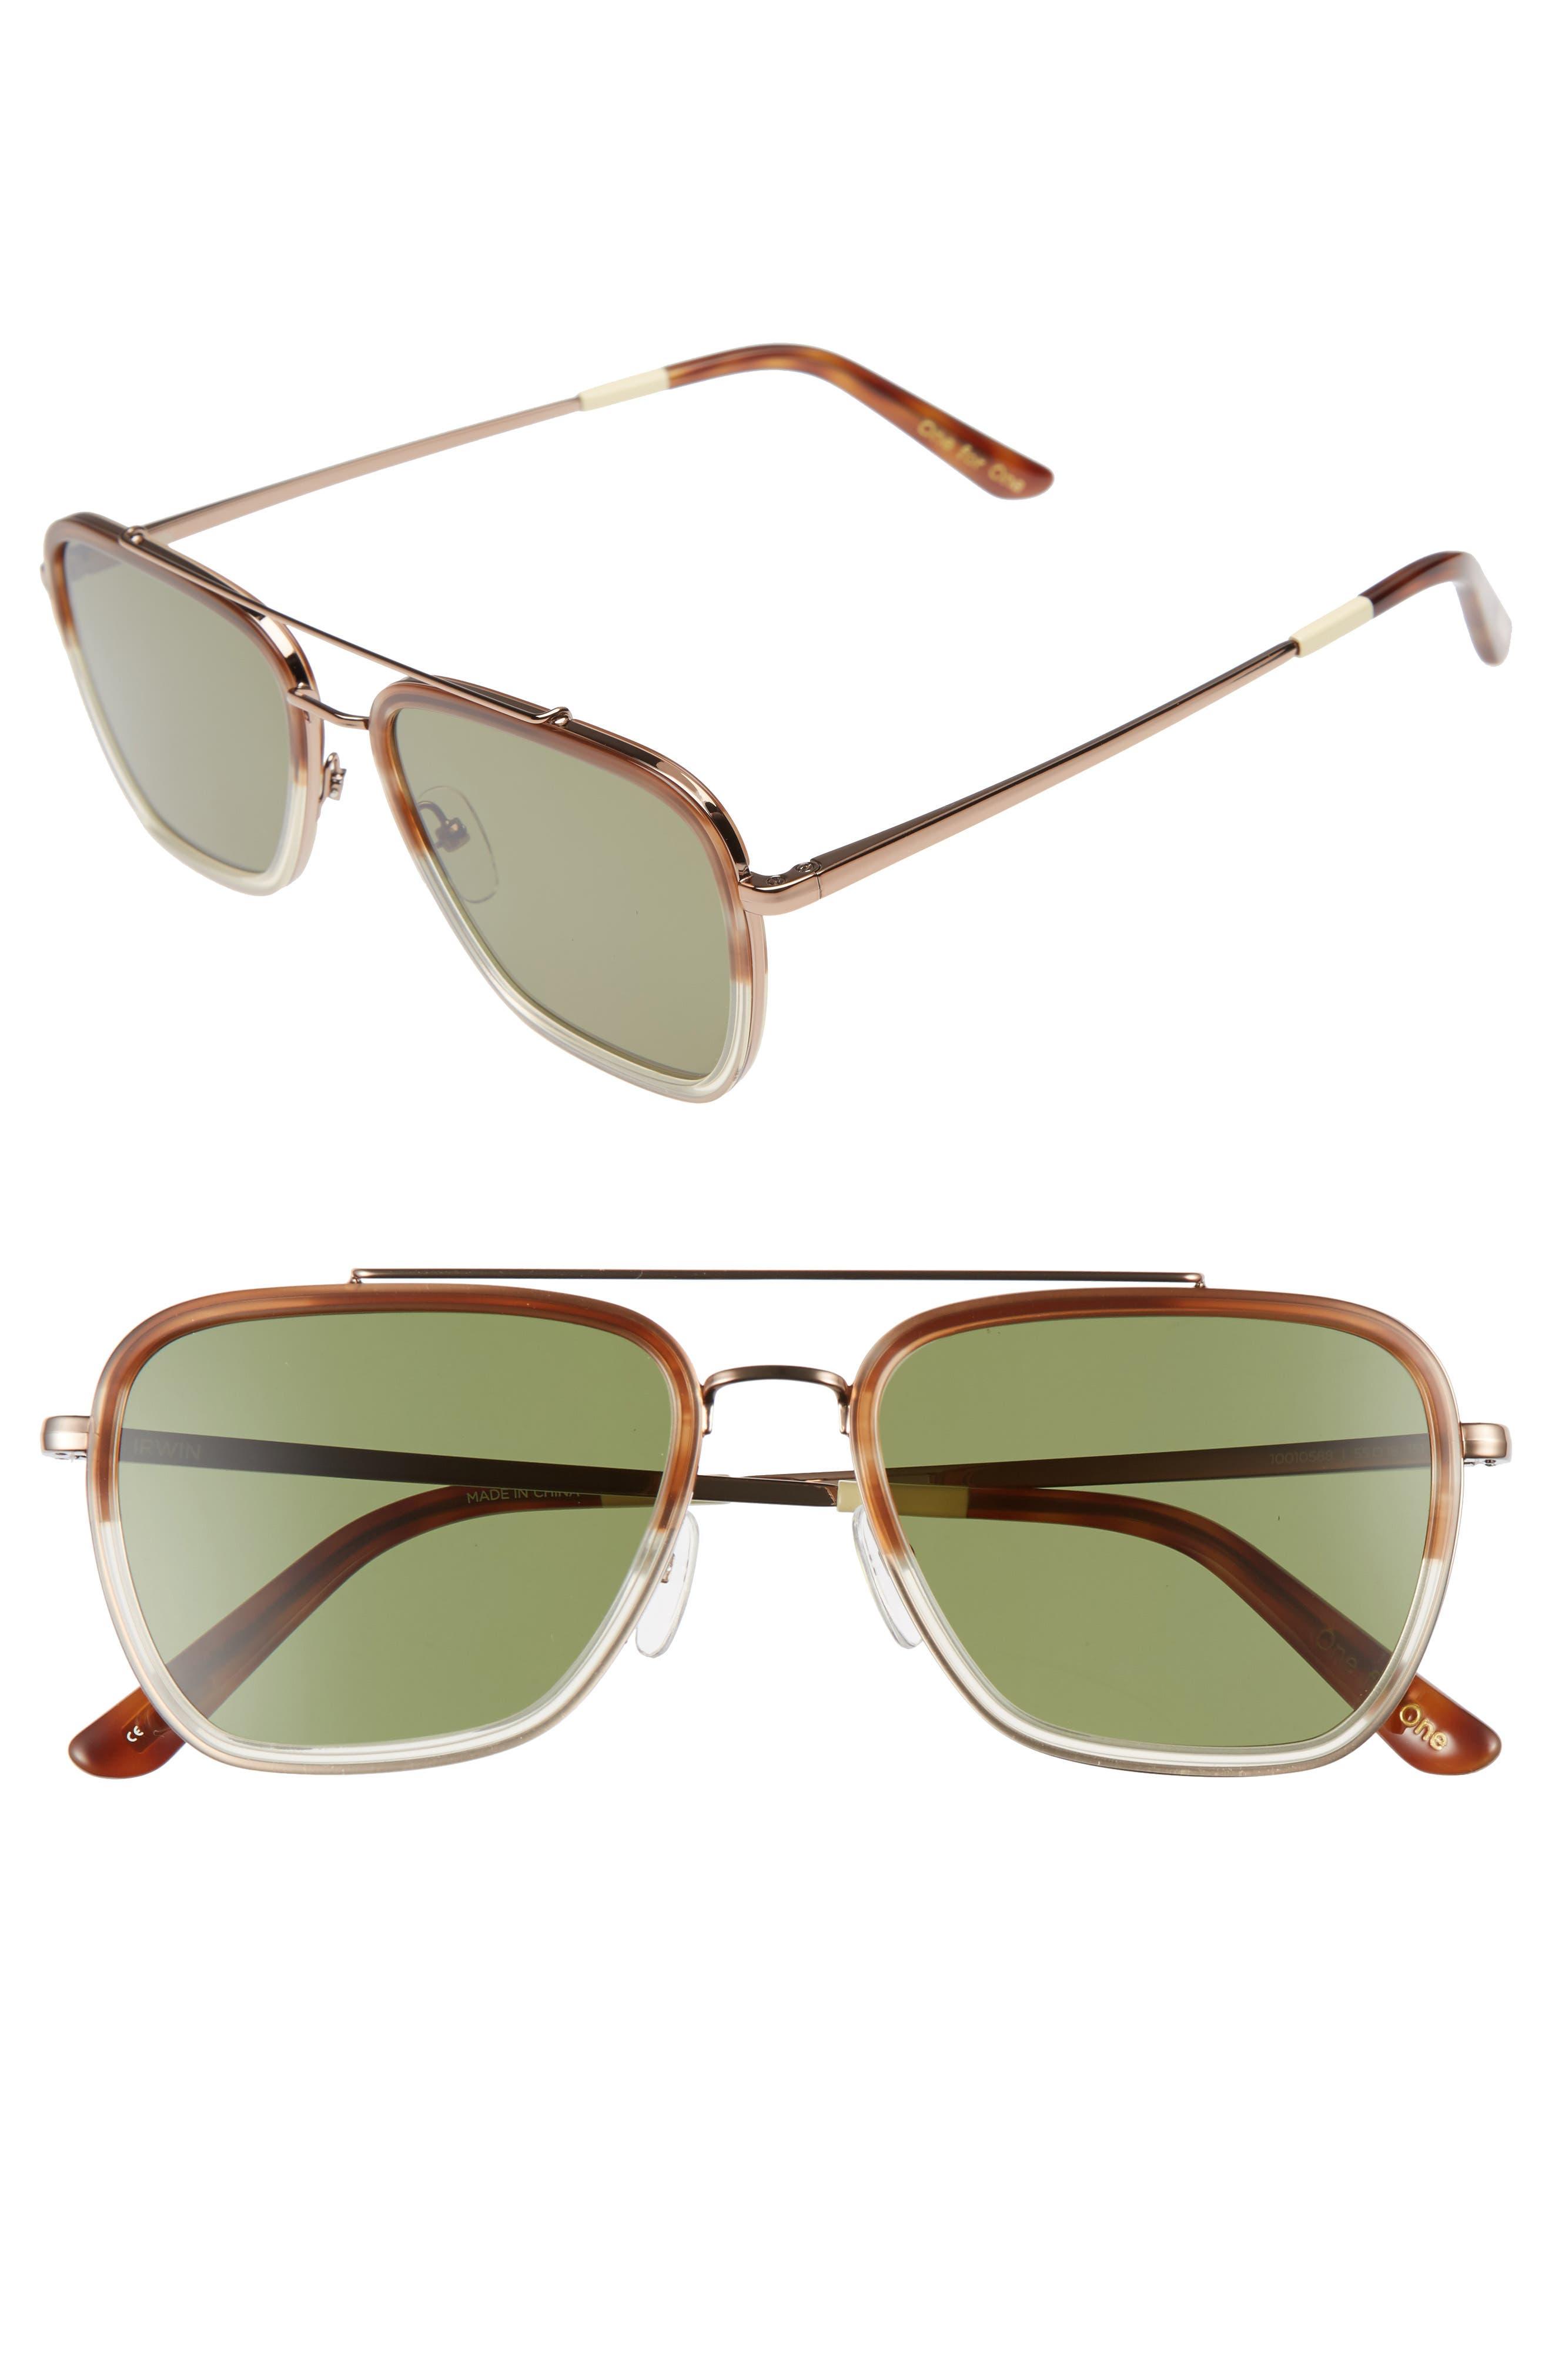 Irwin 55mm Sunglasses,                             Main thumbnail 1, color,                             205